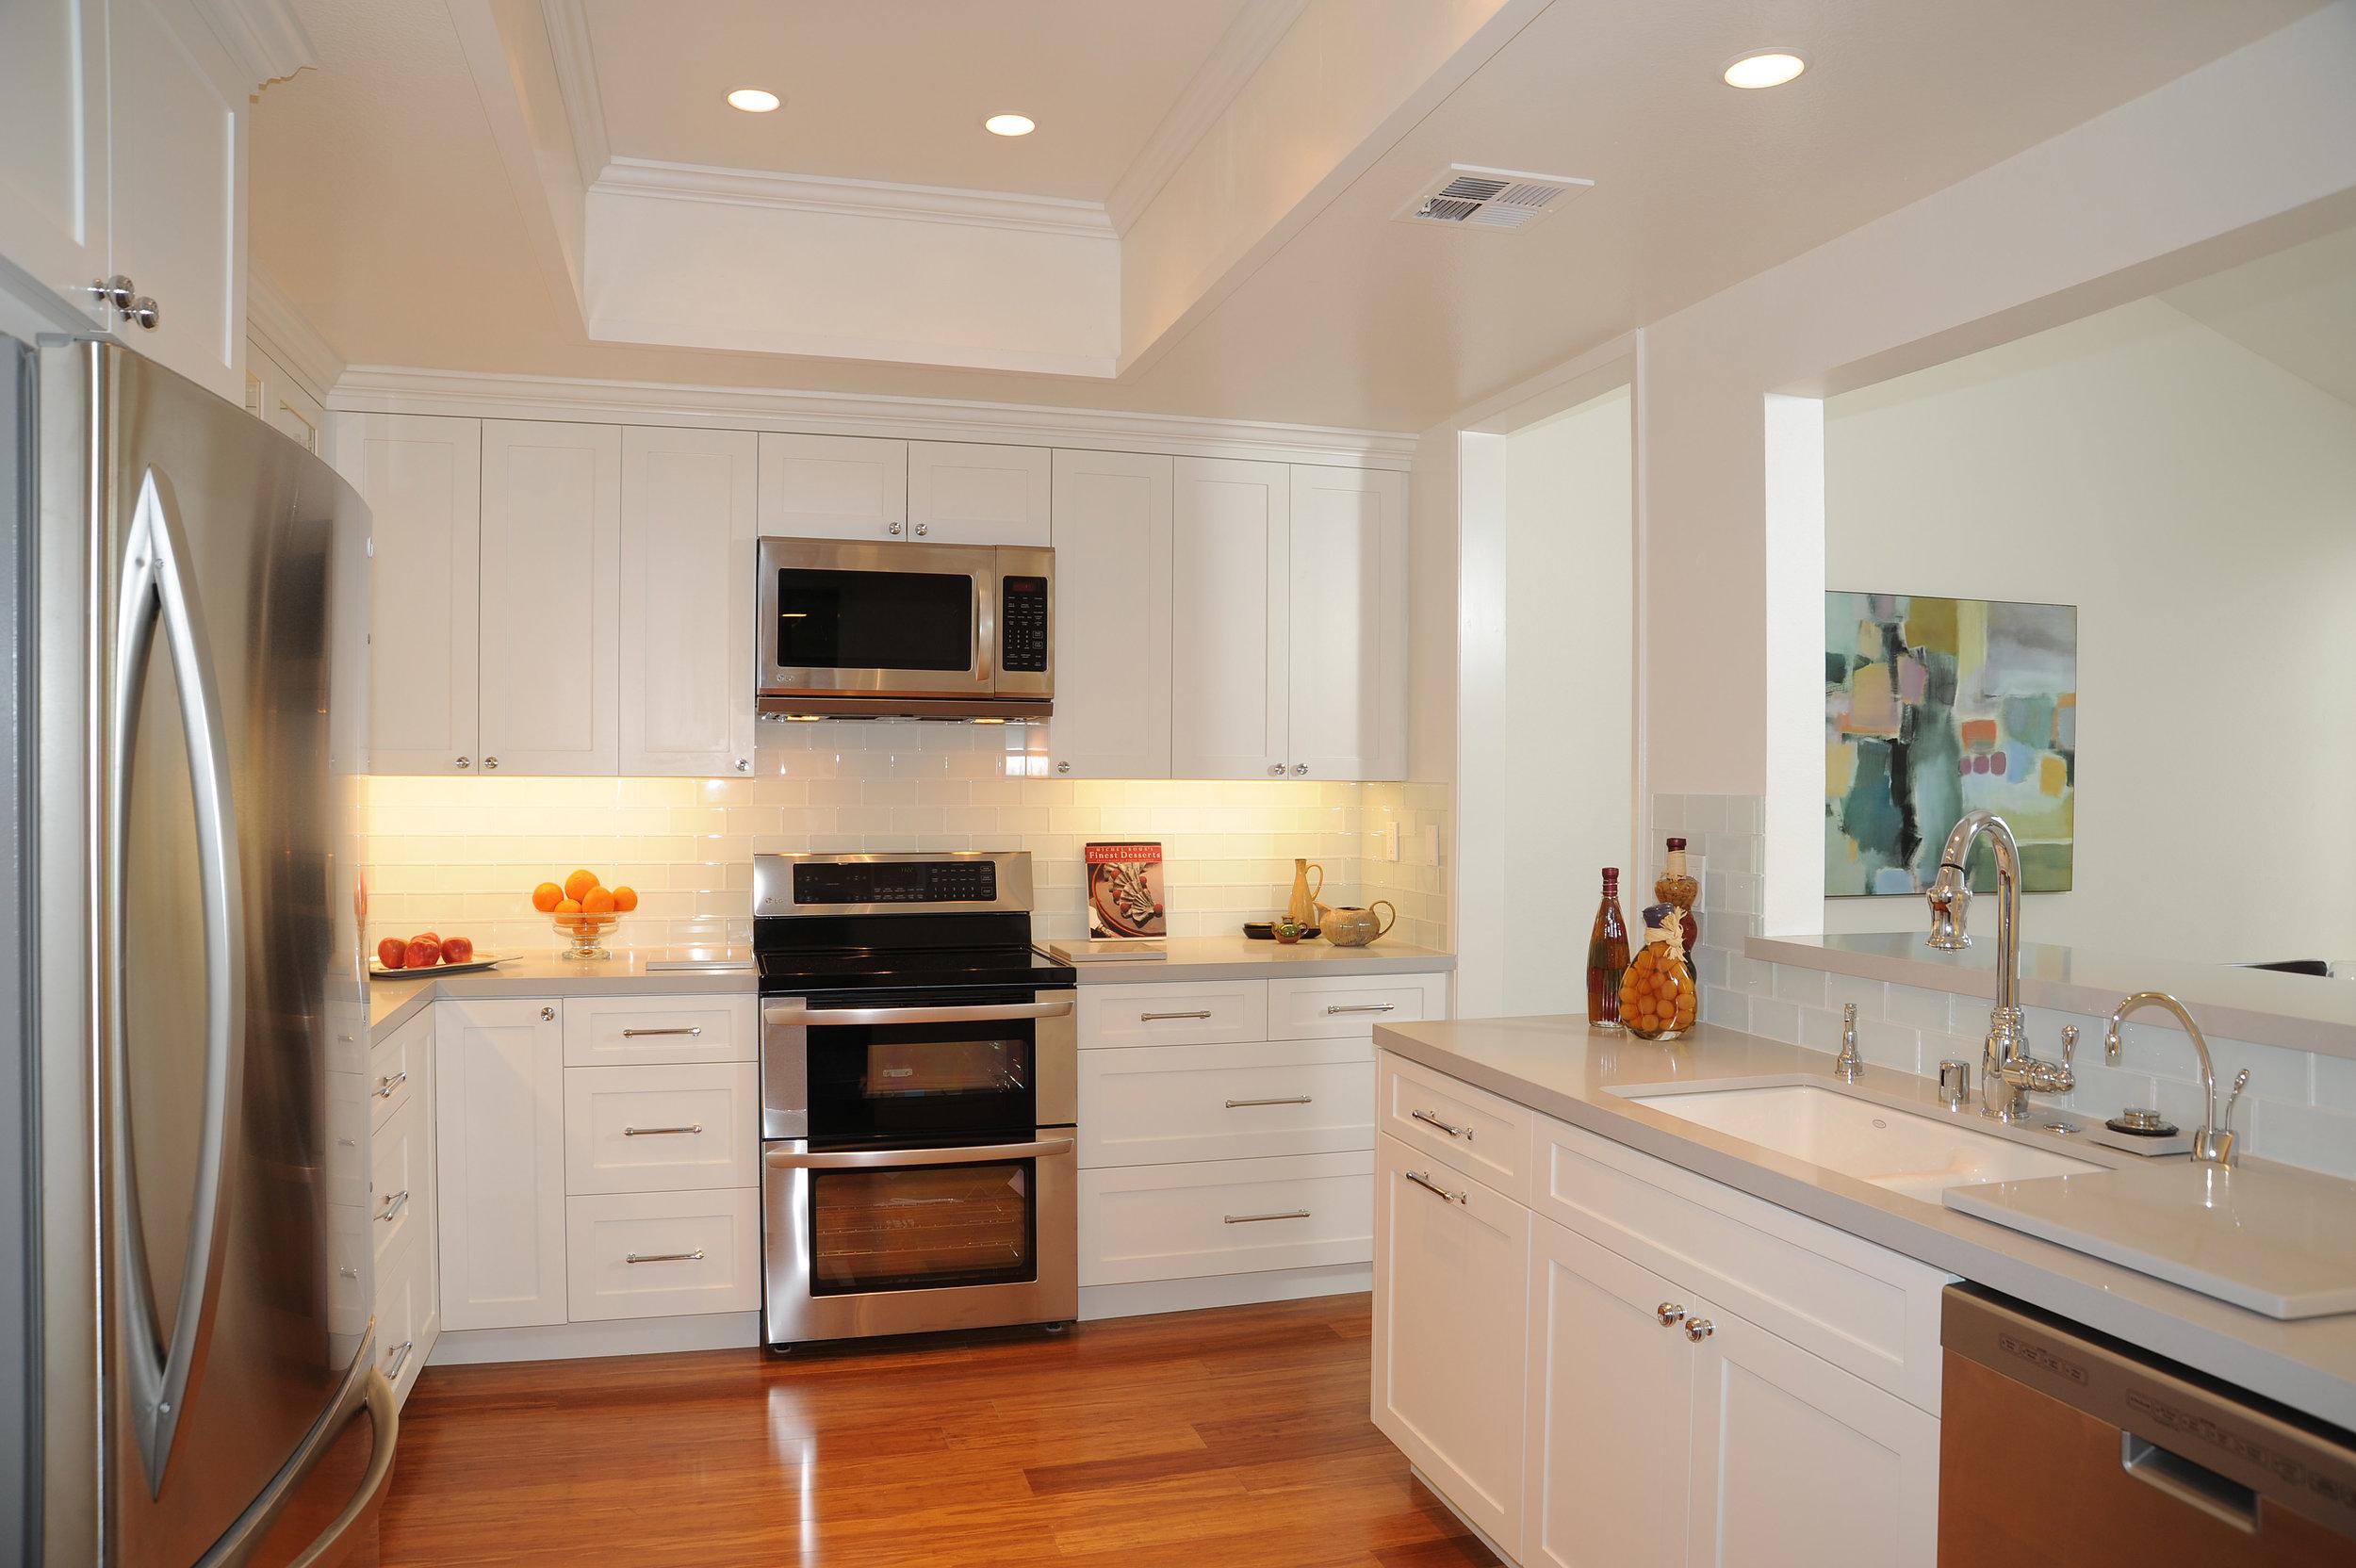 kitchen+1-2477026281-O.jpg